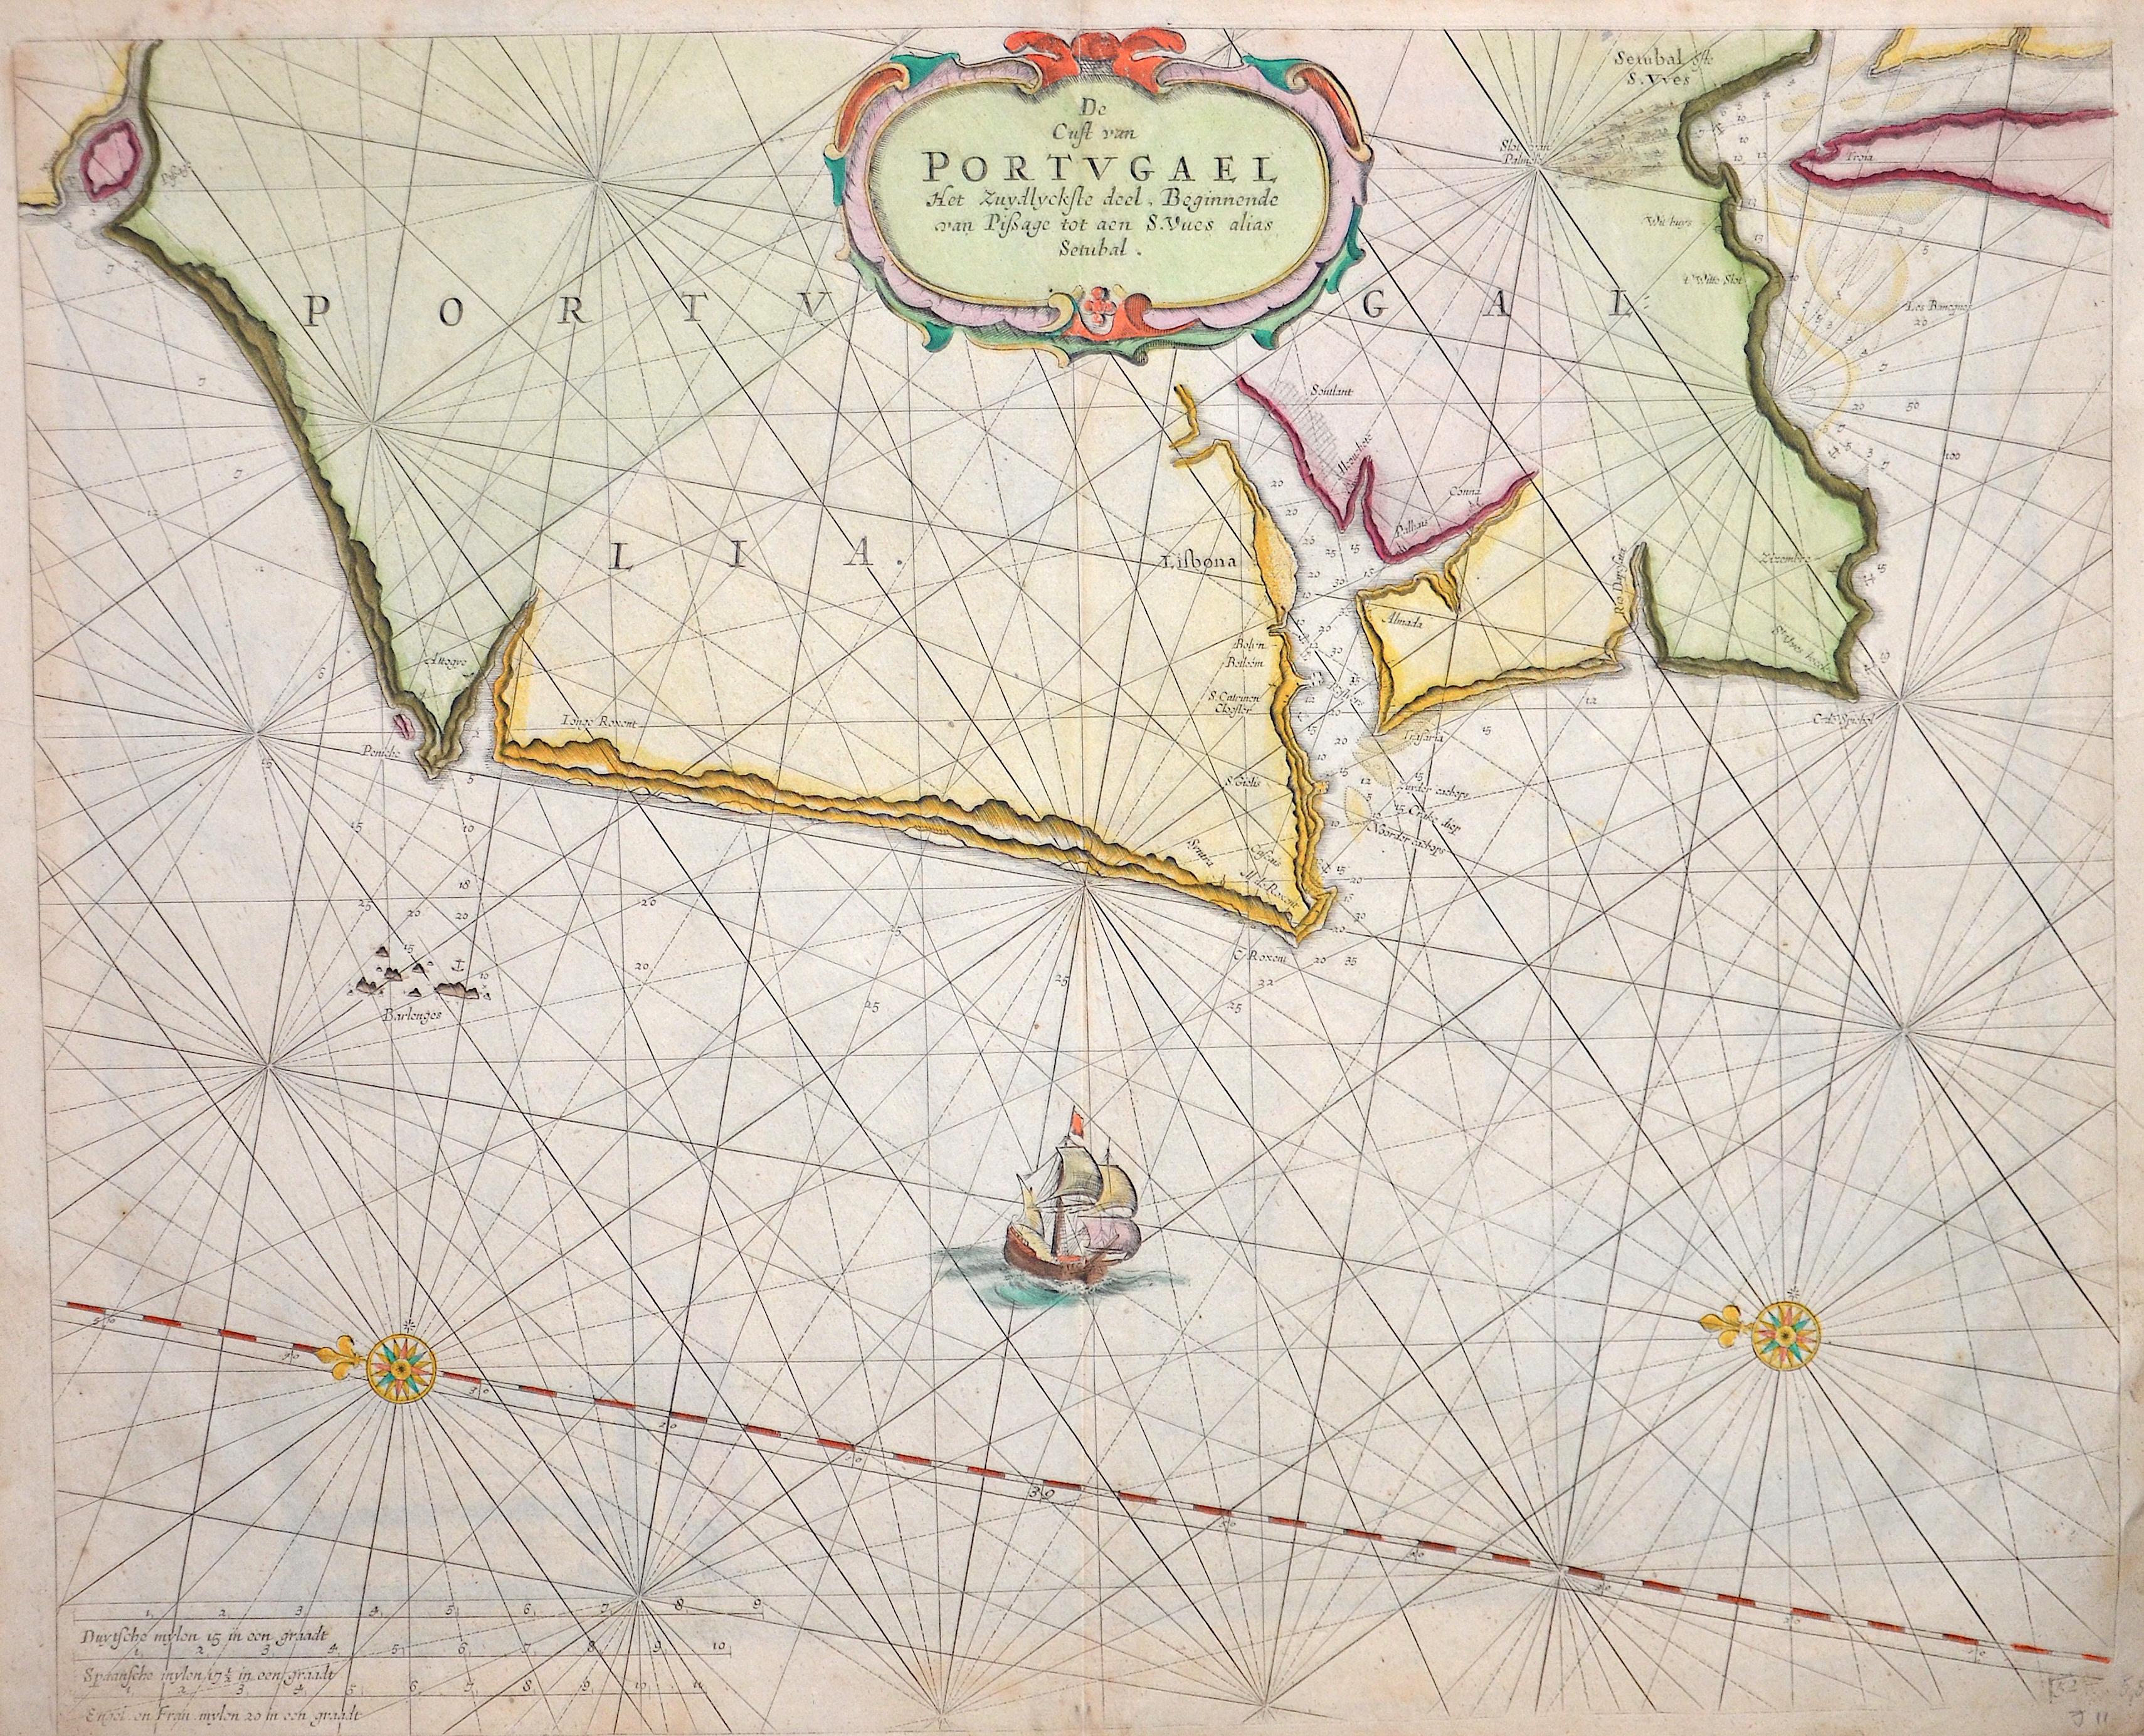 Keulen Gerard van De Cust van Portugael Het Uzydlyckste deel, Beginnende van Pißage tot aen S. Vues alias Setubal.